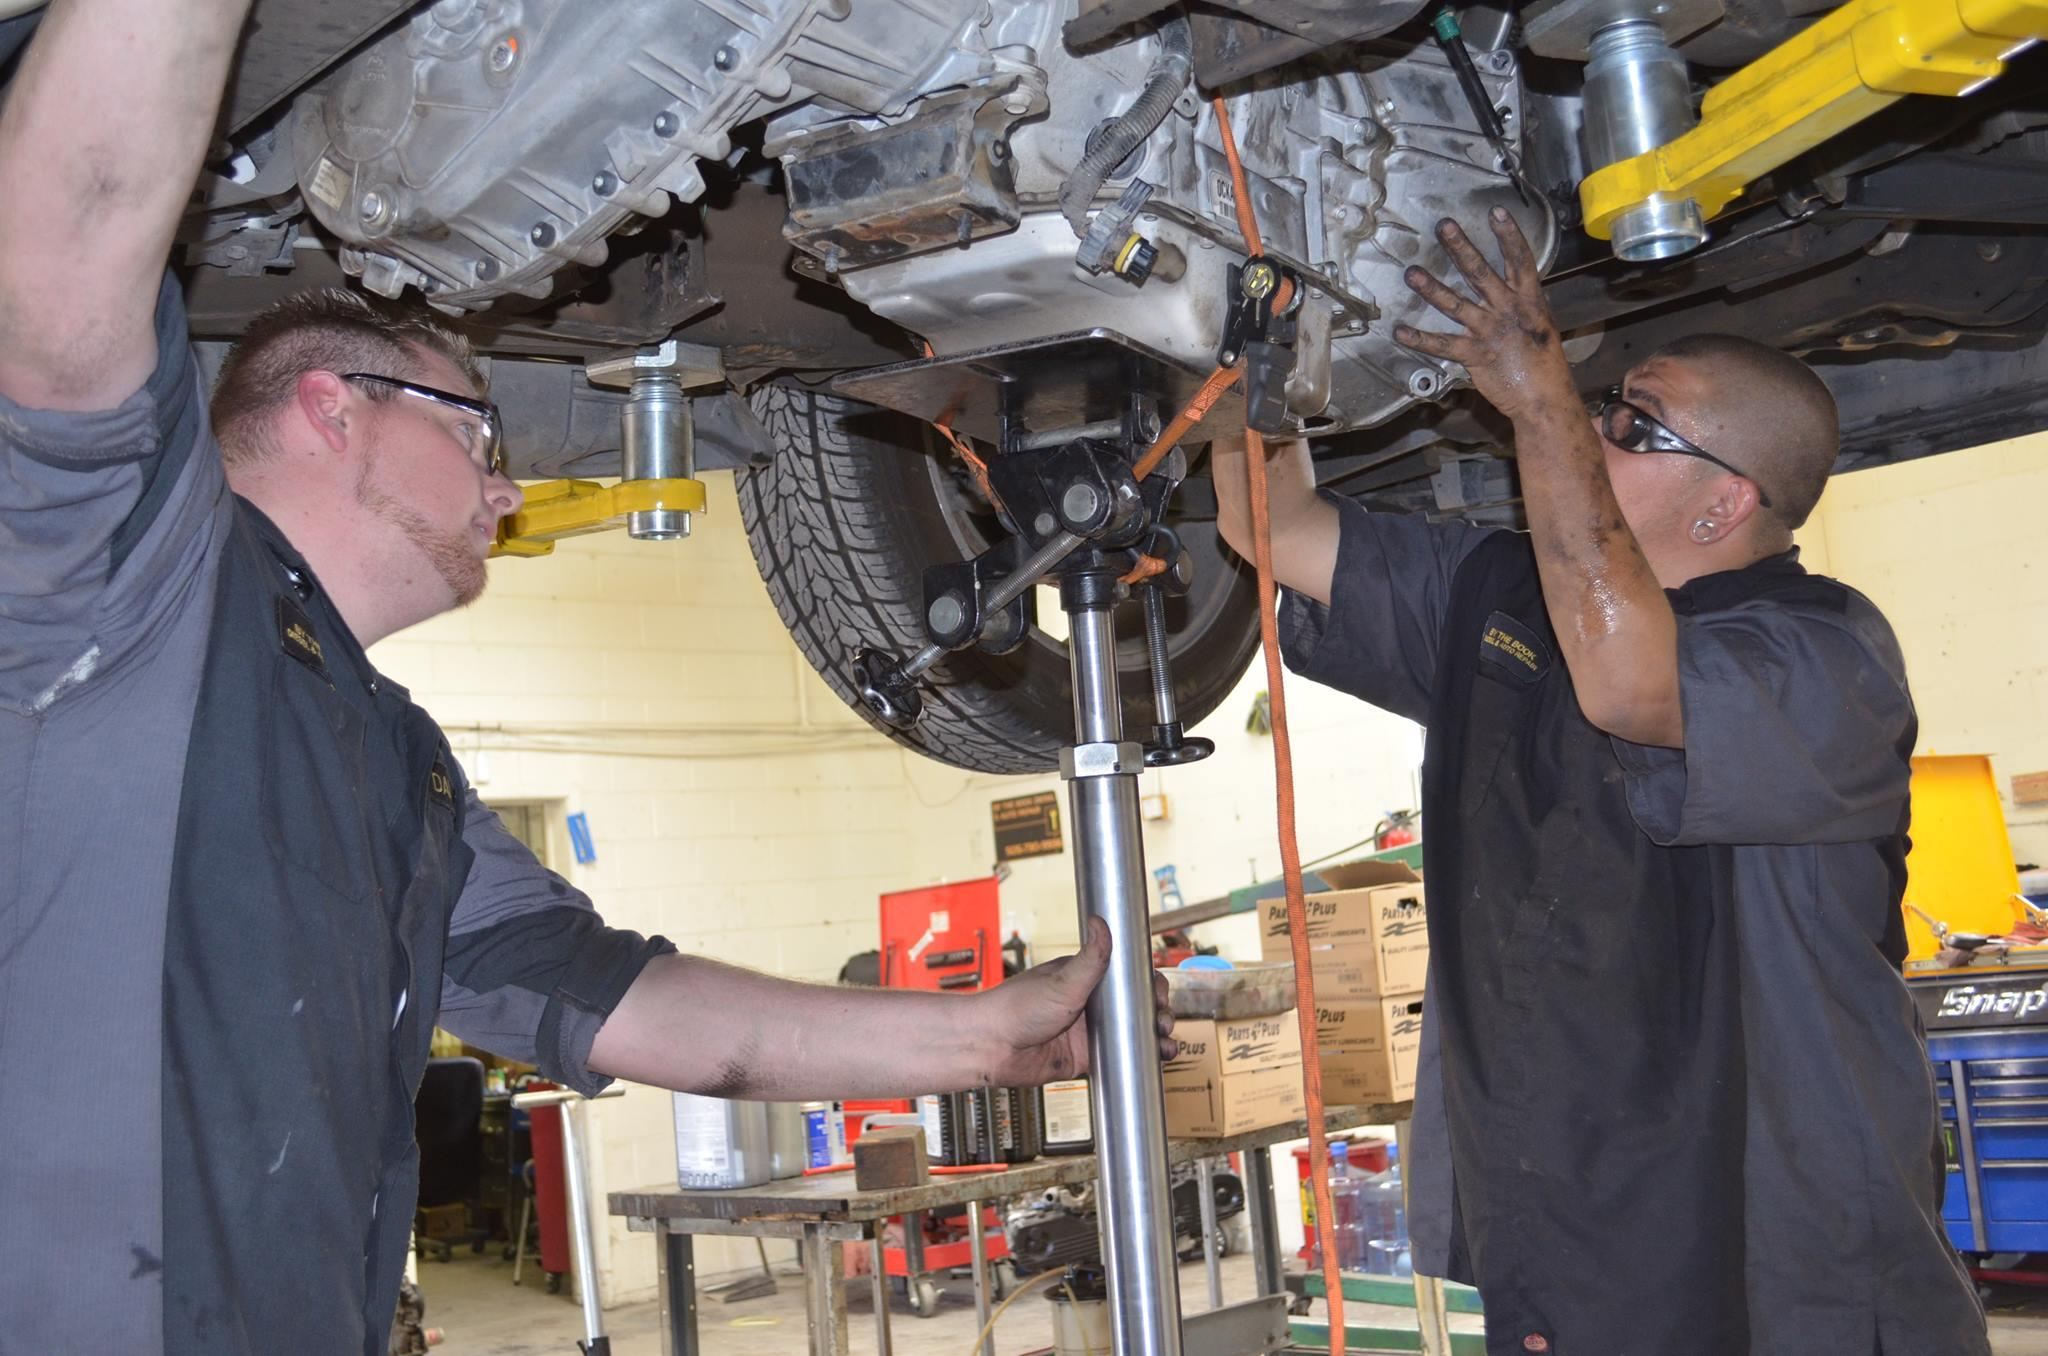 By The Book Diesel & Auto Repair image 2